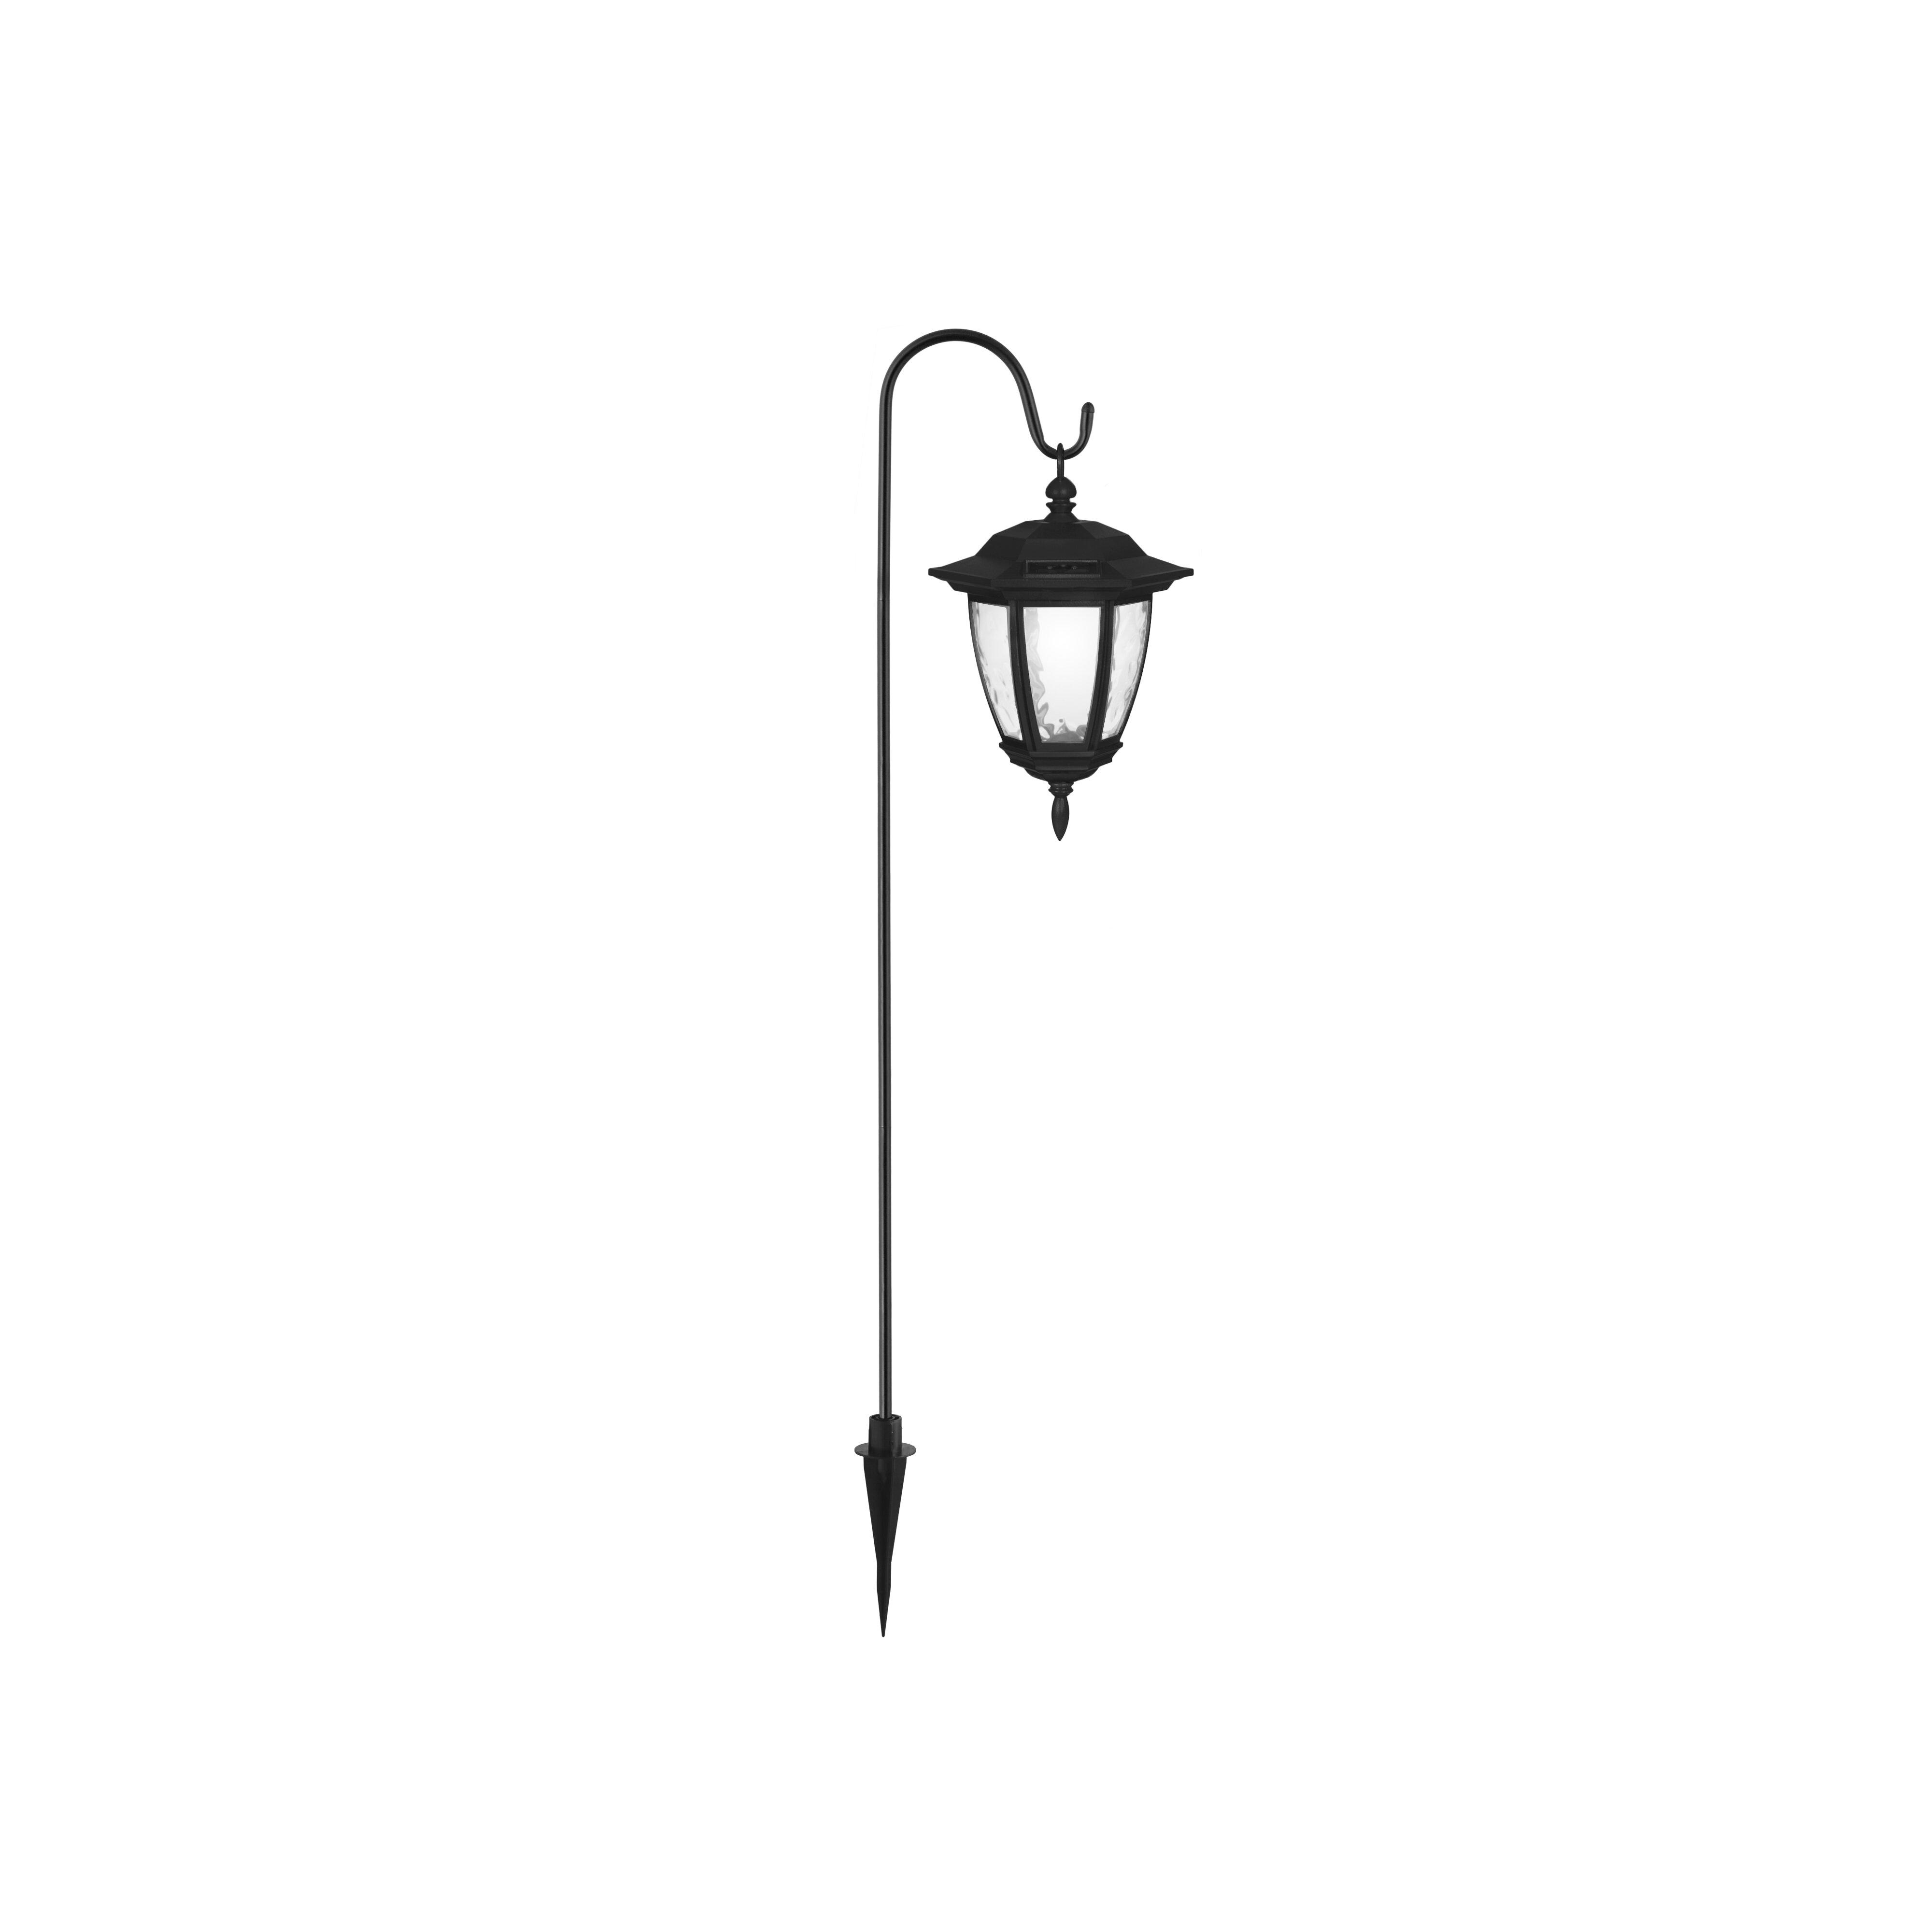 Jiawei Technology 2 Light Pathway Light Kit Amp Reviews